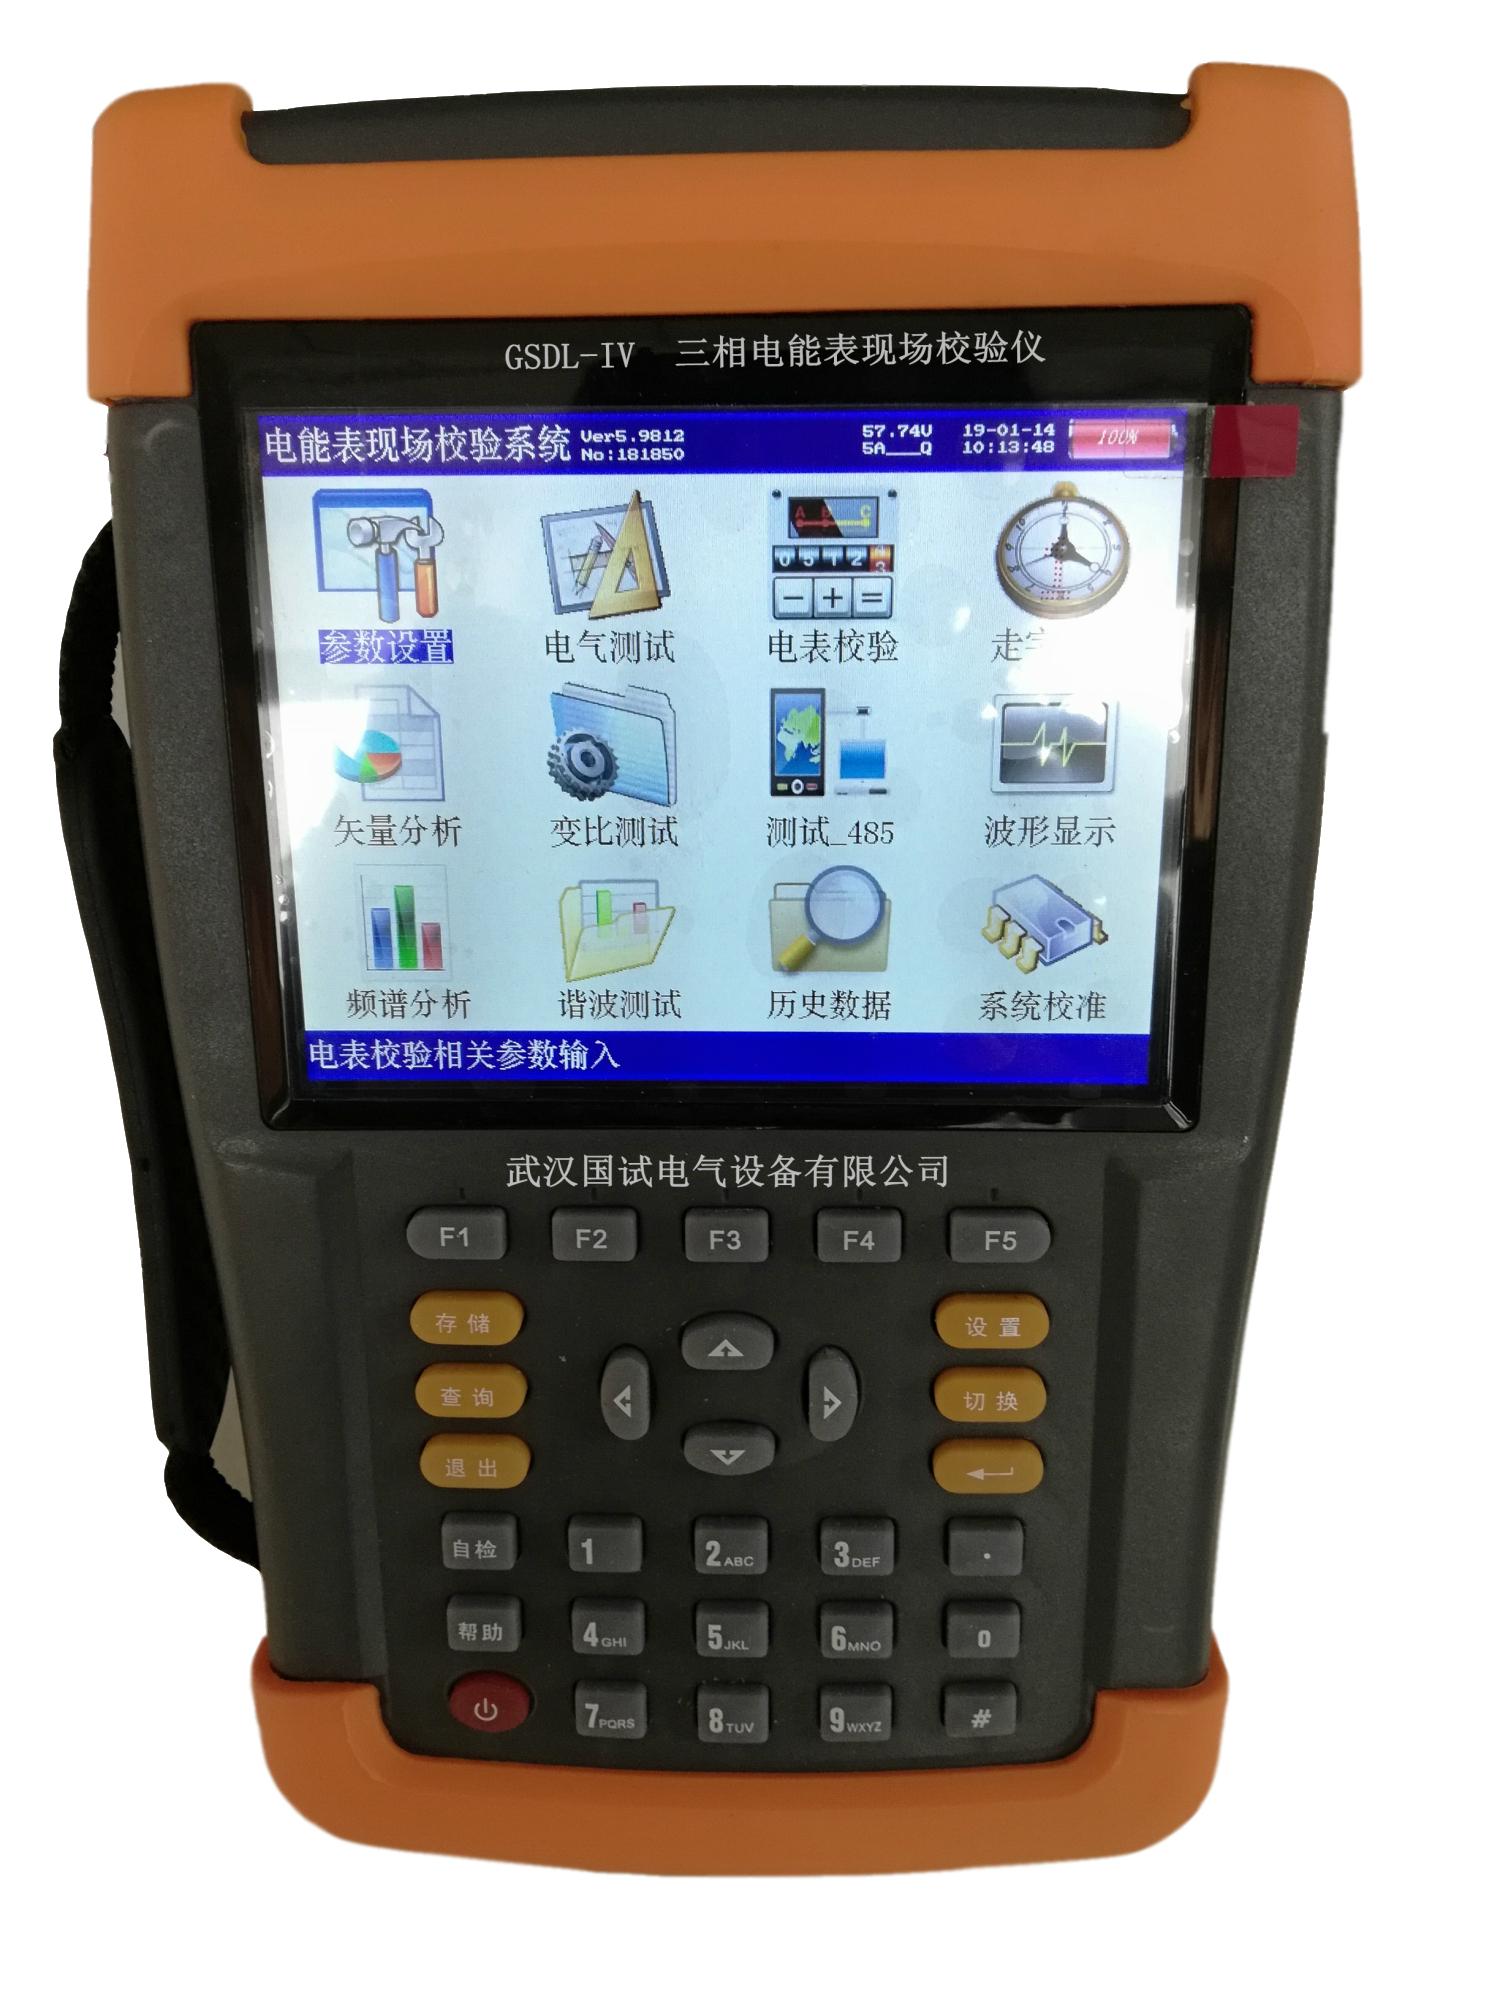 09.GSDL-IV手持式三相电能表现场查验仪